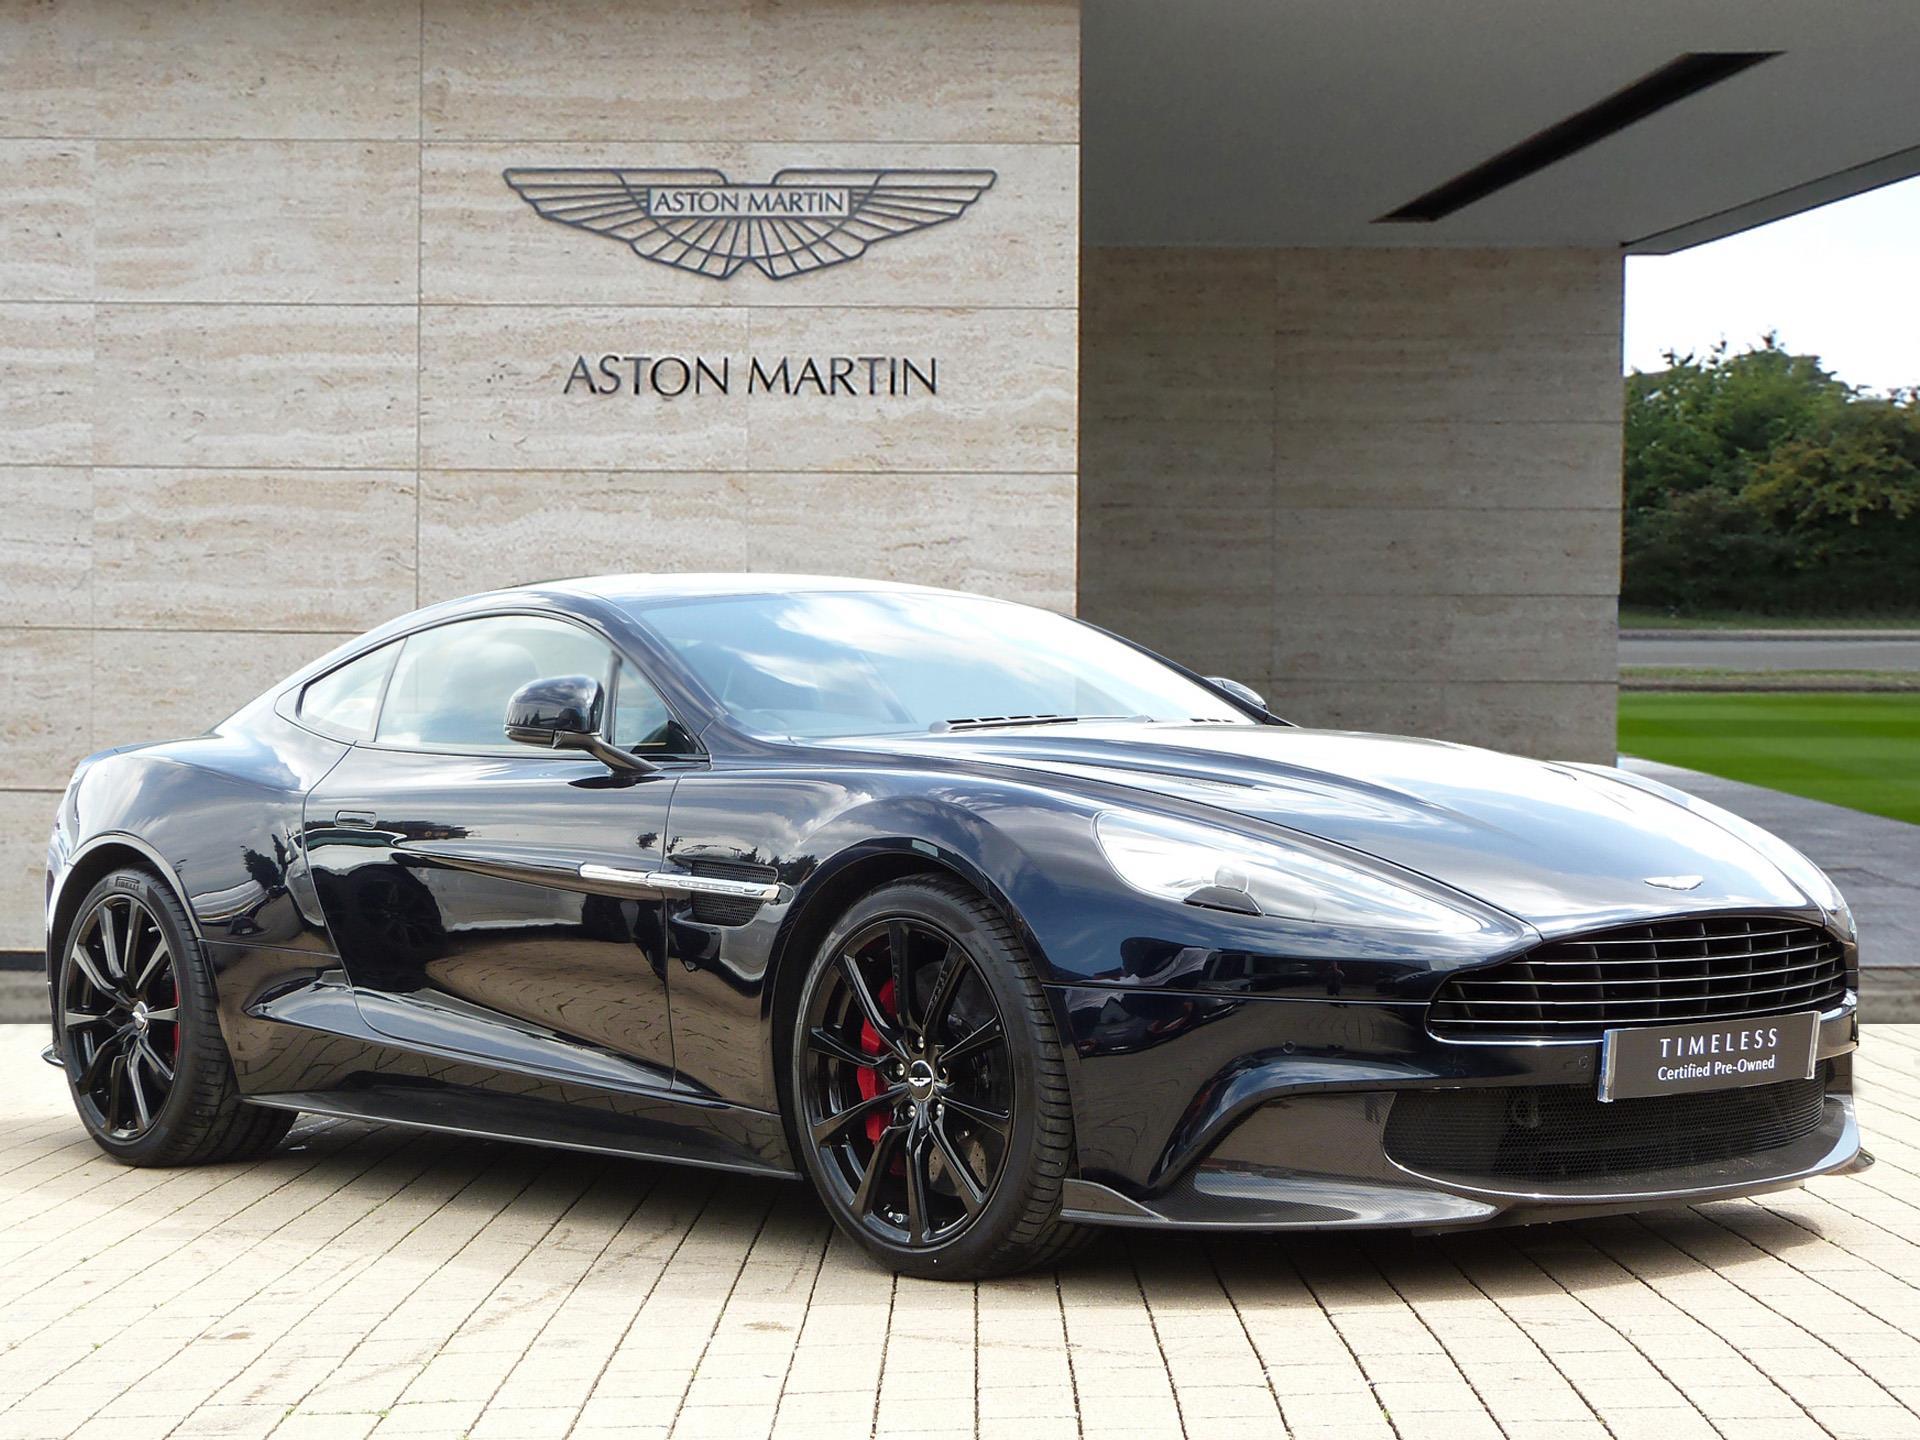 Aston Martin Lagonda PreOwned Used Aston Martins Car Details - Certified pre owned aston martin